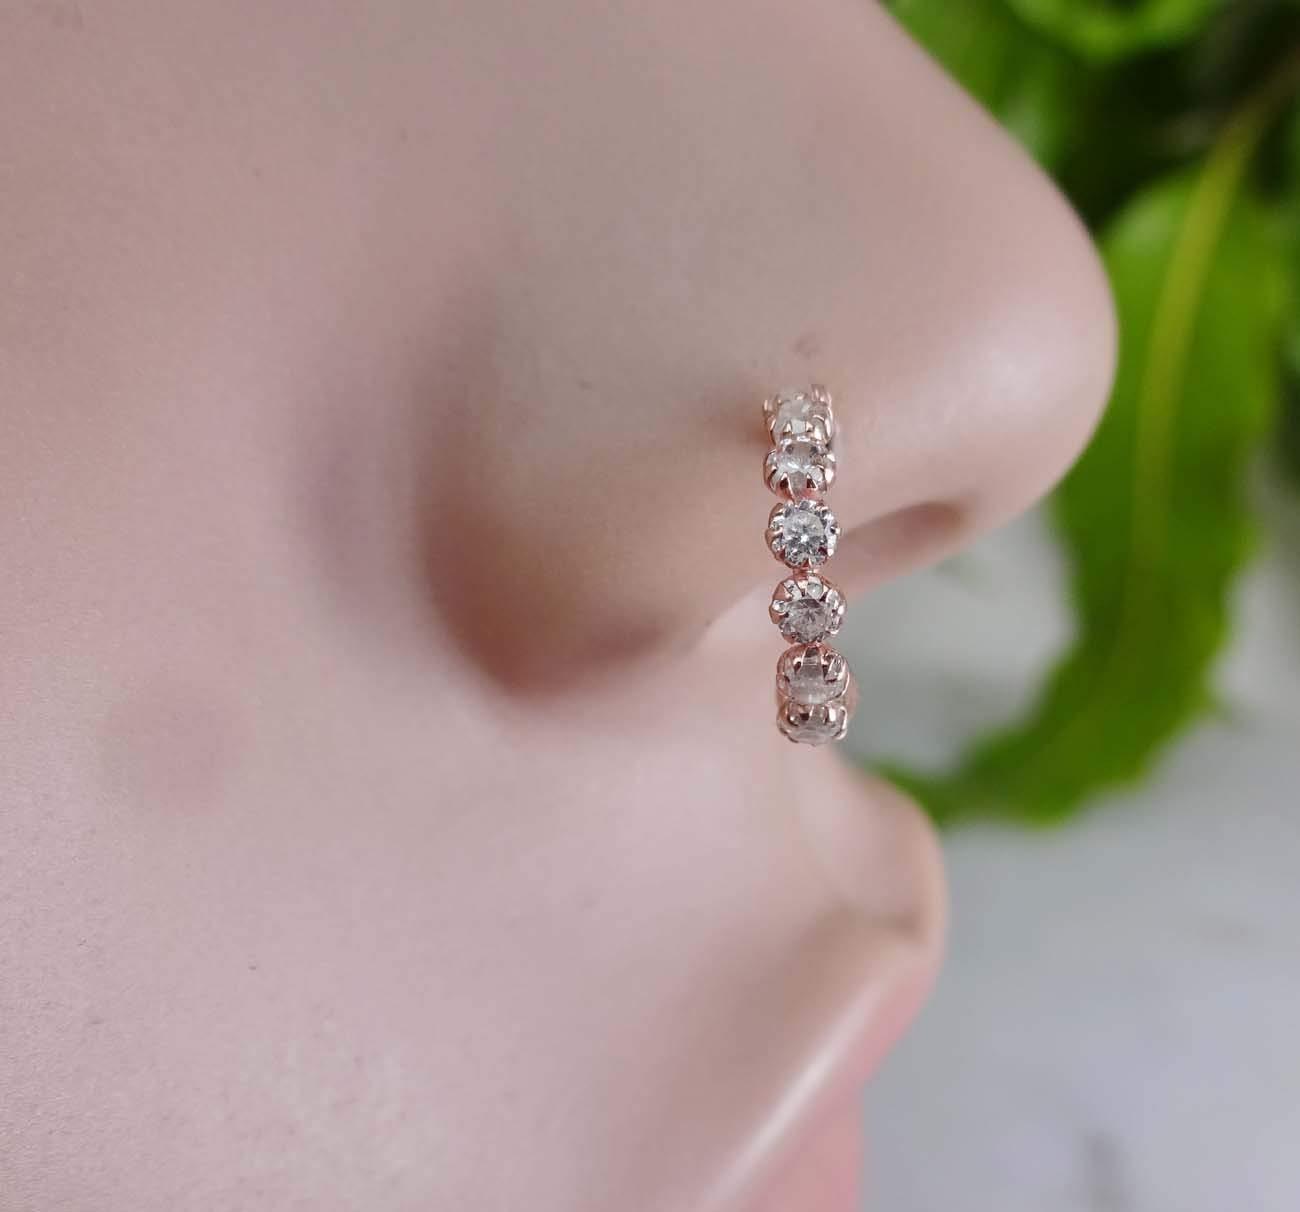 Amazon Com Crystal Nose Ring Rose Gold Nose Ring Diamond Nose Hoop Rose Gold Nose Hoop Indian Nose Ring Indian Nose Hoop Traditional Nose Piercing Gold Nose Hoop